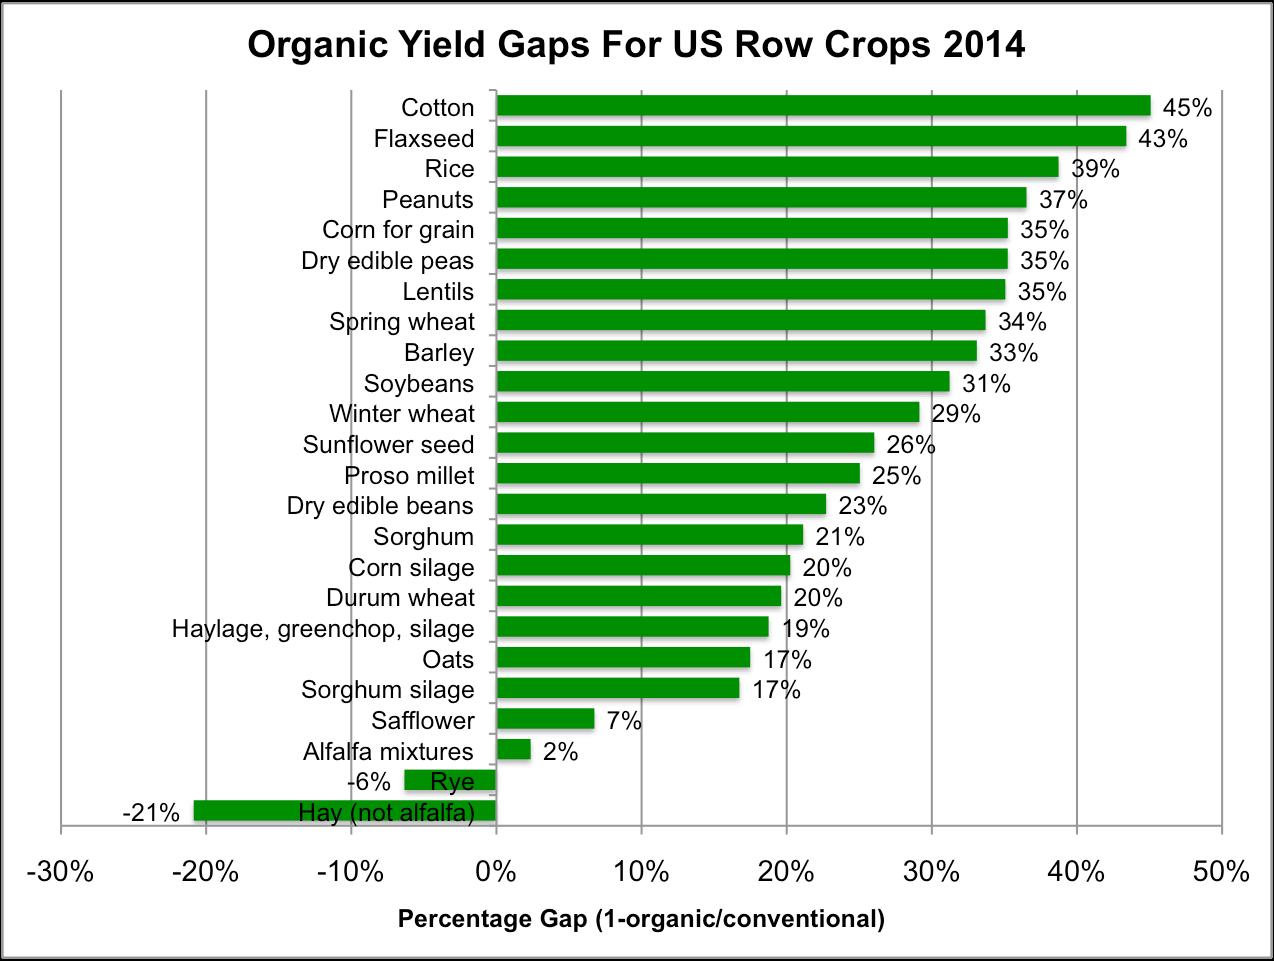 Row Crop Gaps